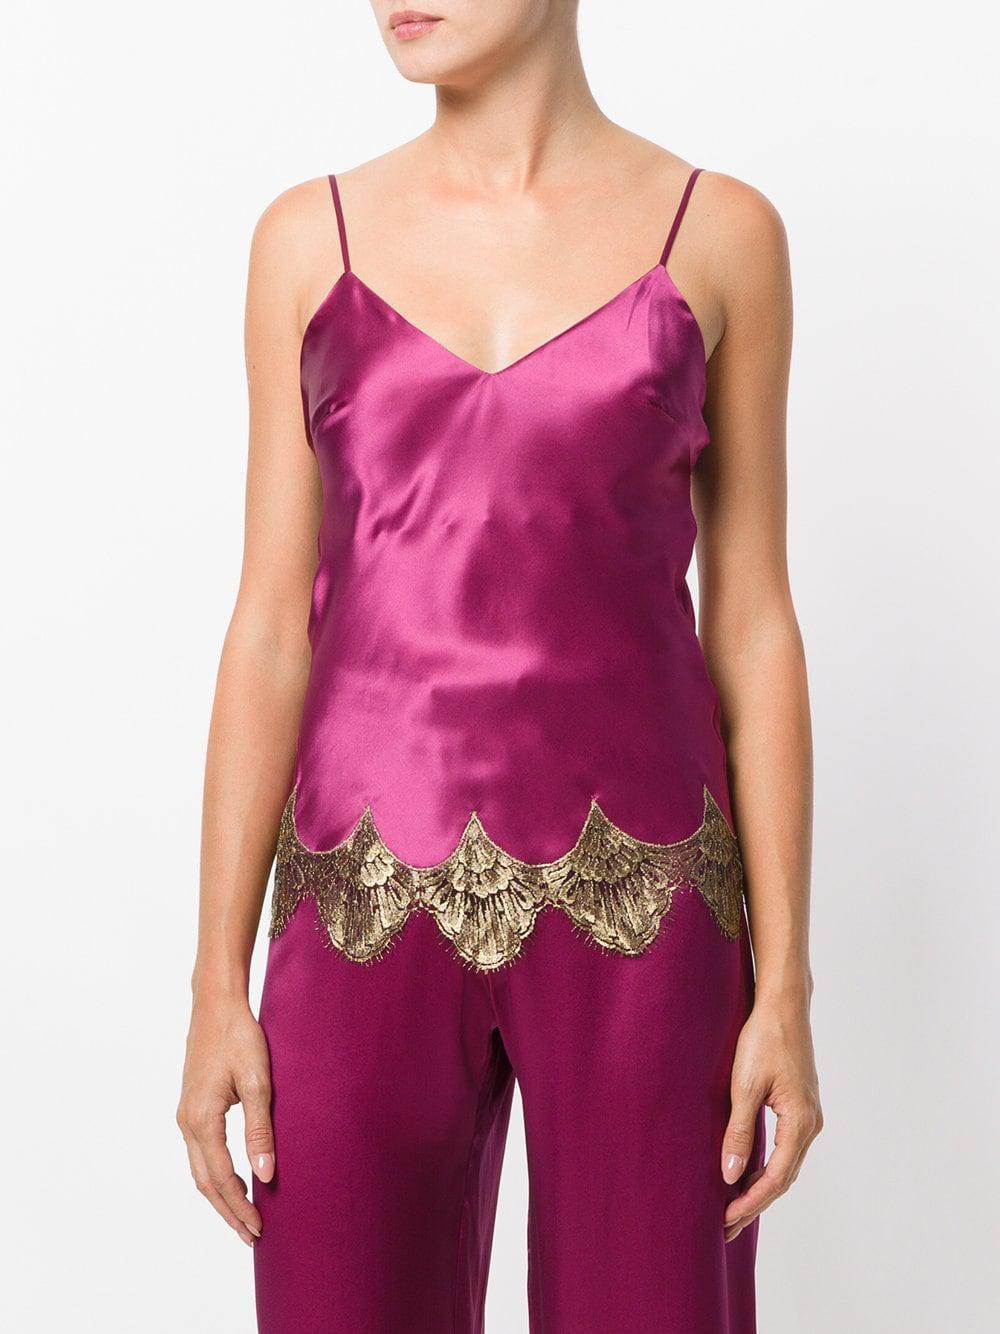 703b42f3c0c Lyst - Gilda   Pearl Lace Trim Camisole in Pink